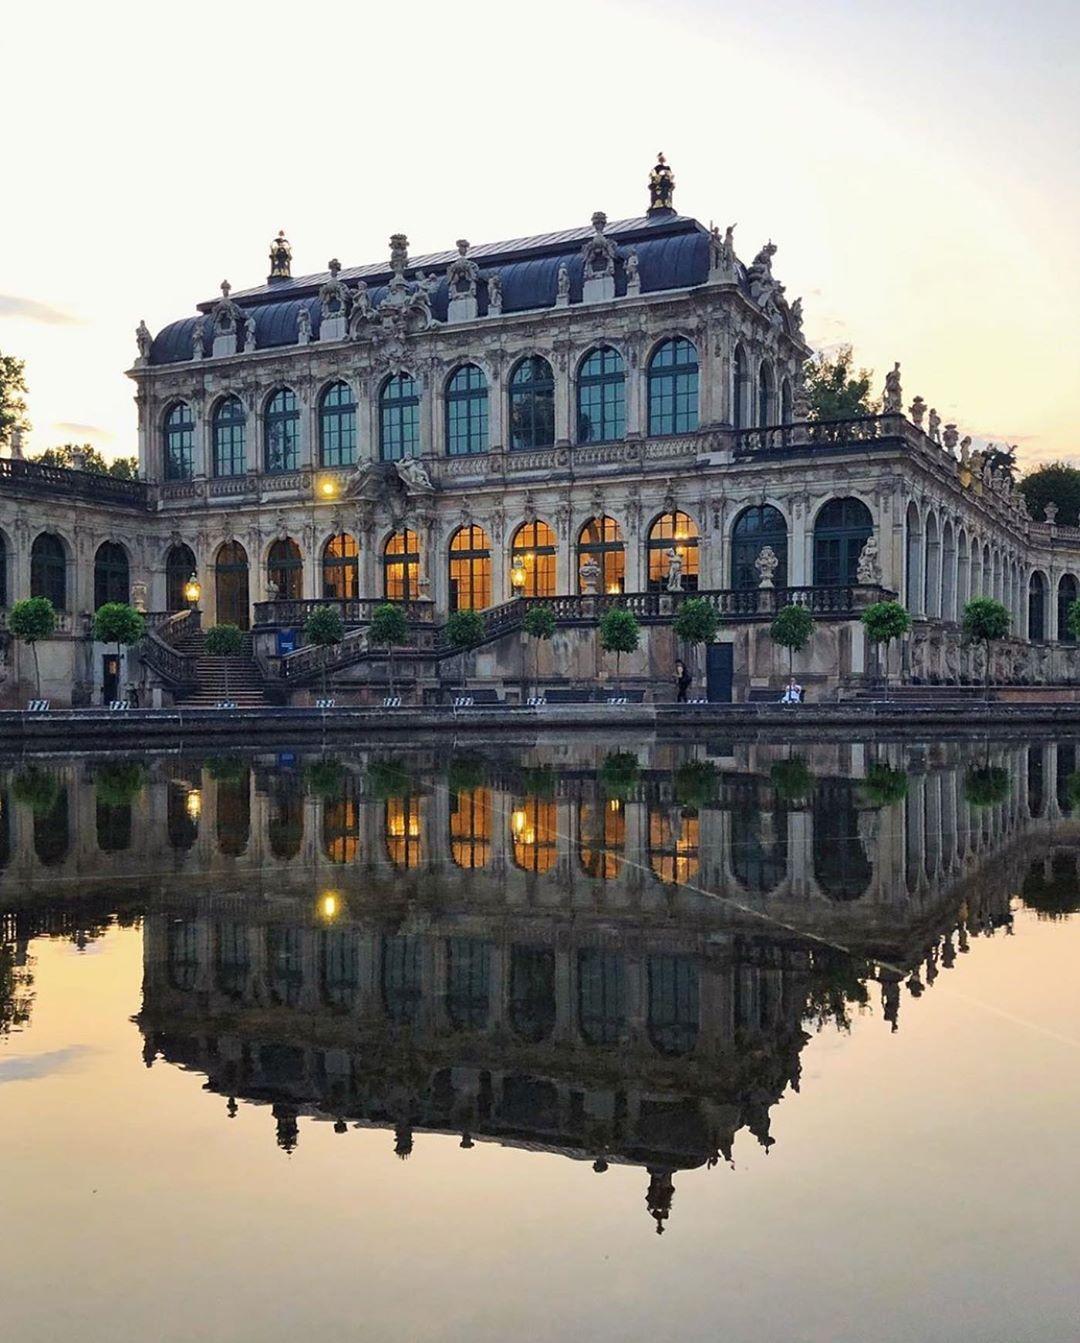 The Best Of Dresden V Instagram Present Bild Des Tages Photo By Jaroslaw Marciuk Location Zwinger Dr Places Around The World Around The Worlds World